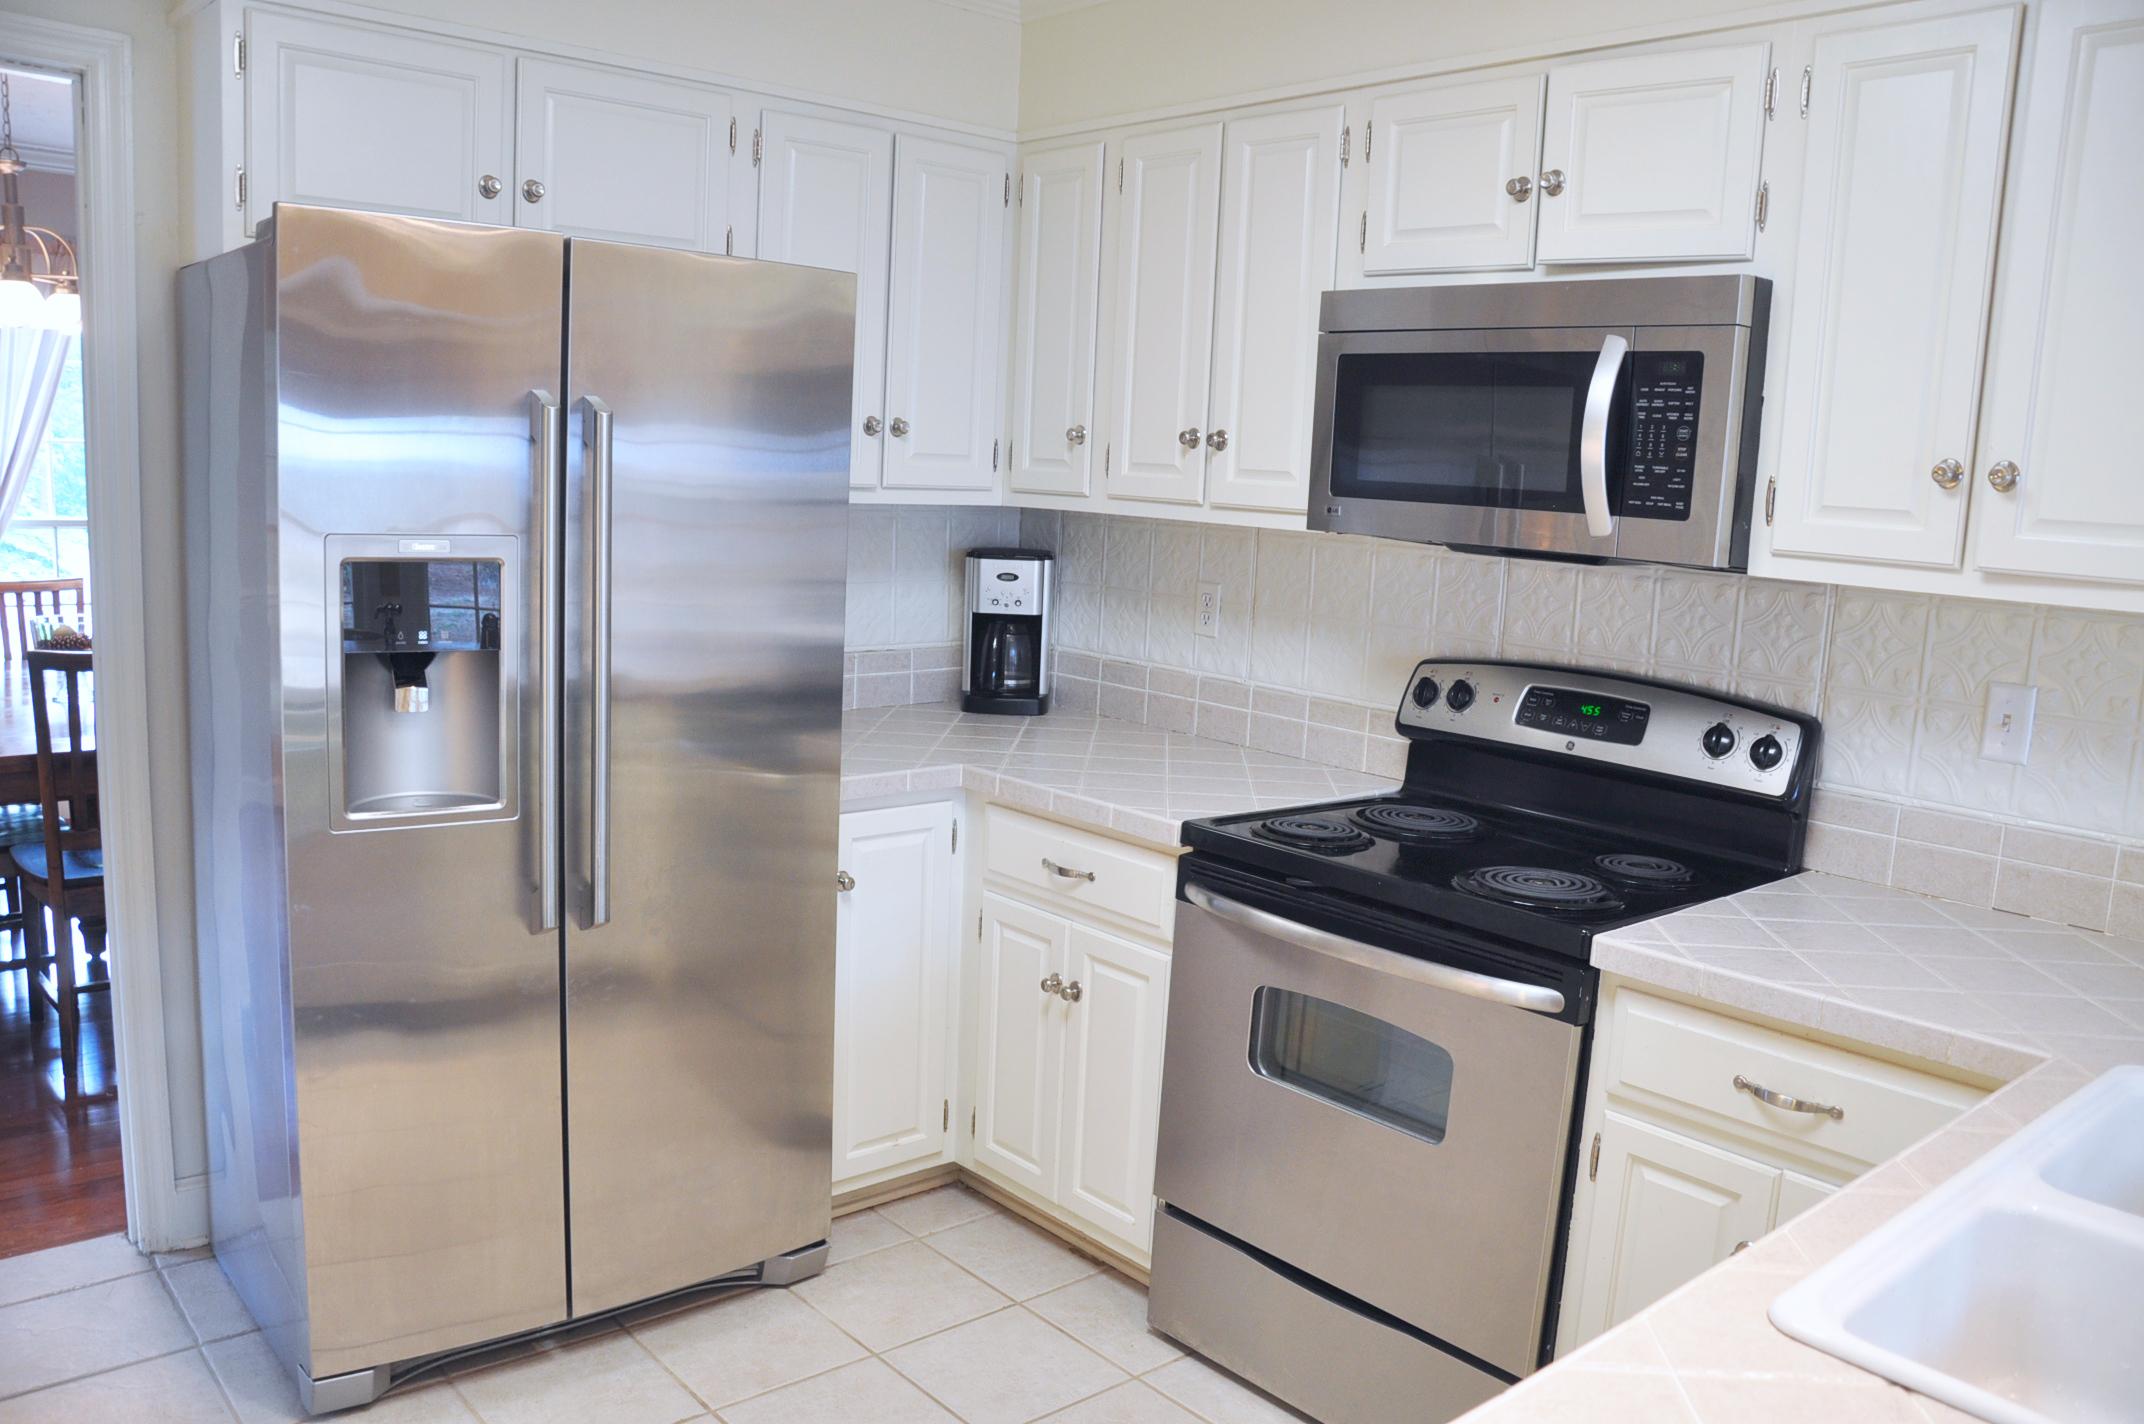 house kitchen four.jpg